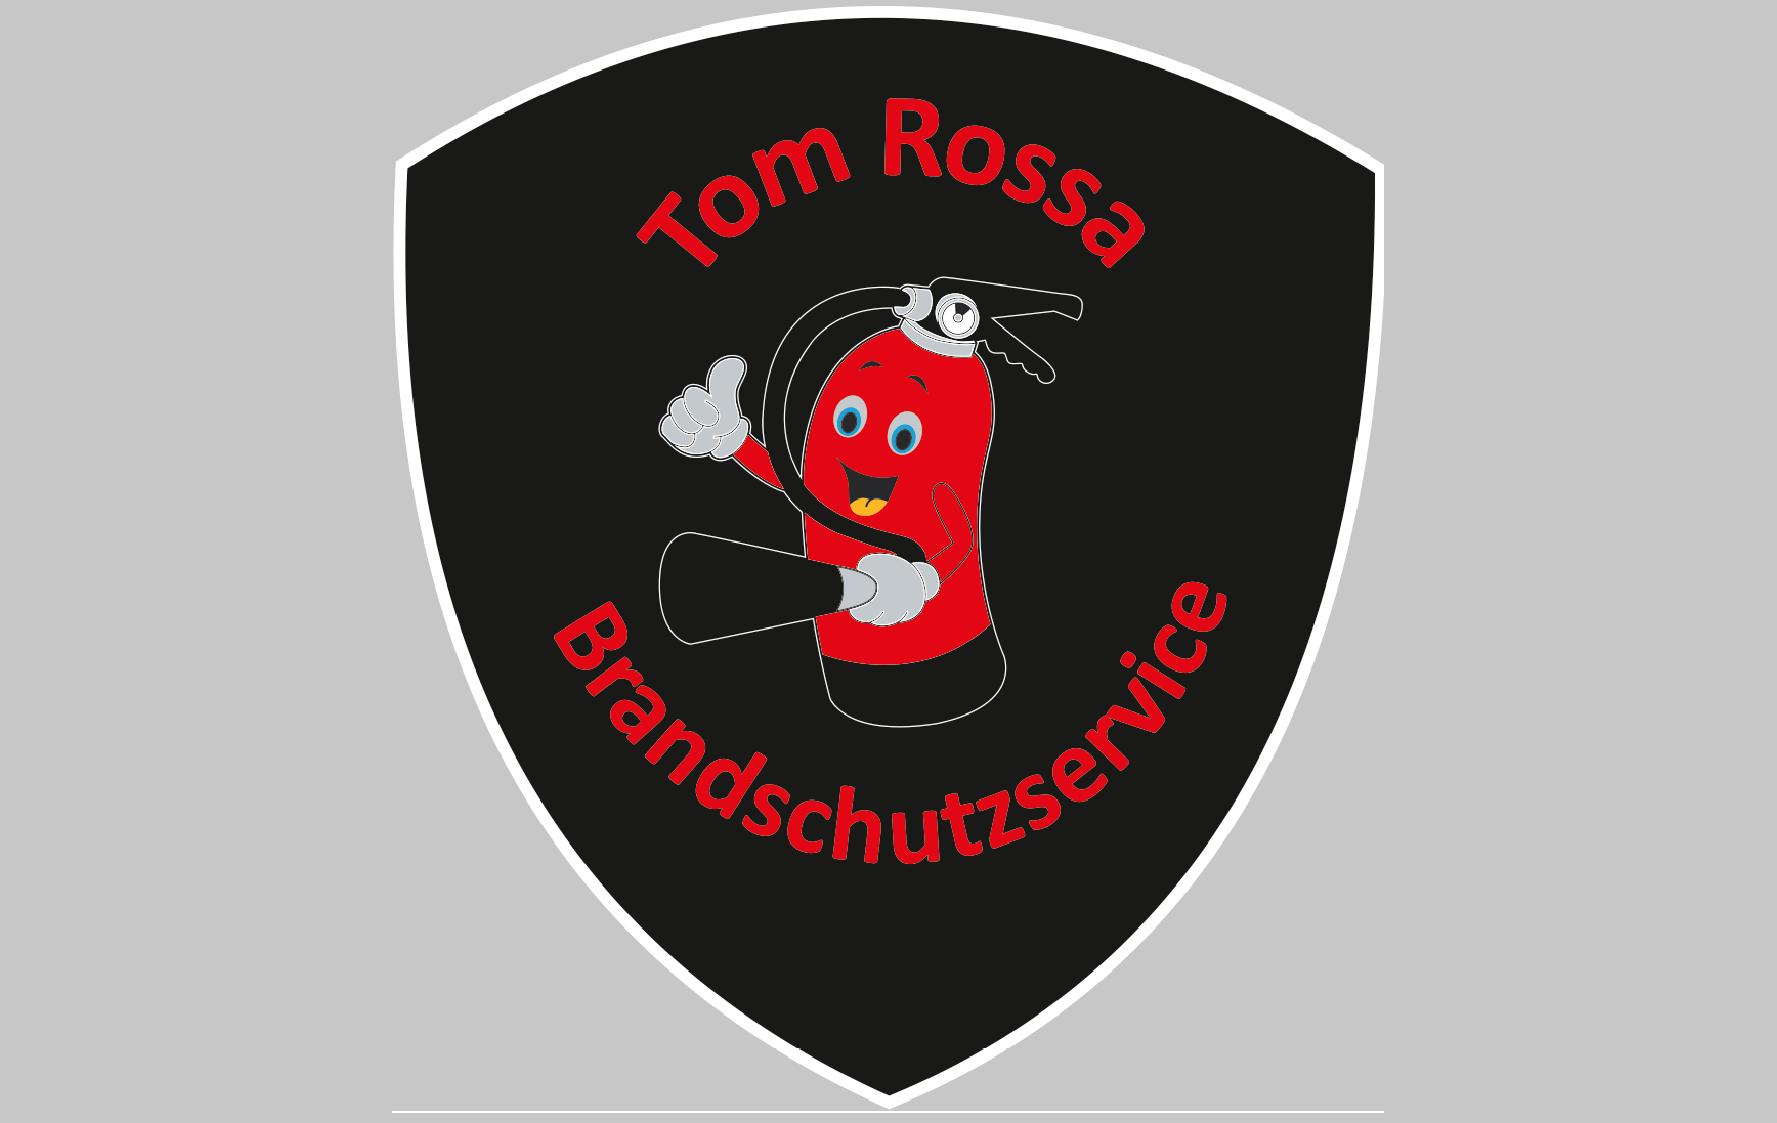 Tom Rossa